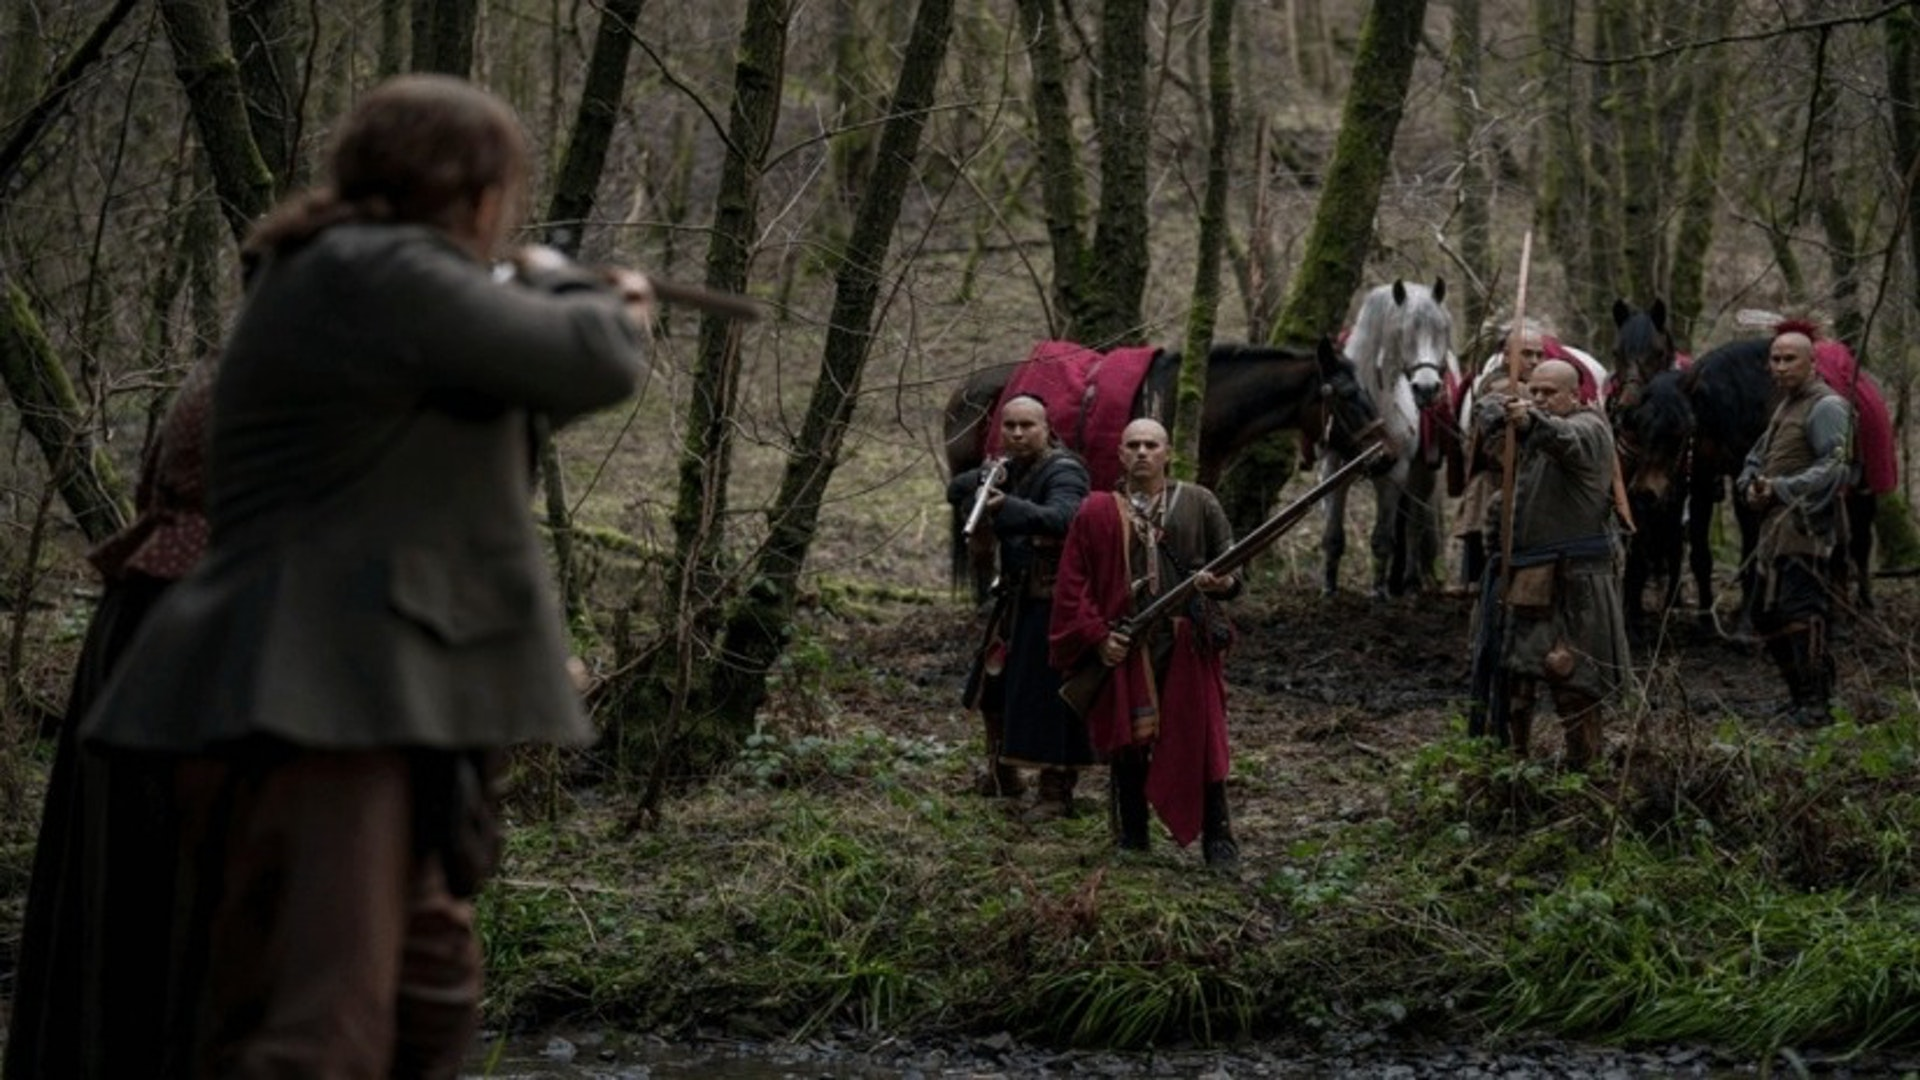 outlander-season-4-episode-5-review-savages